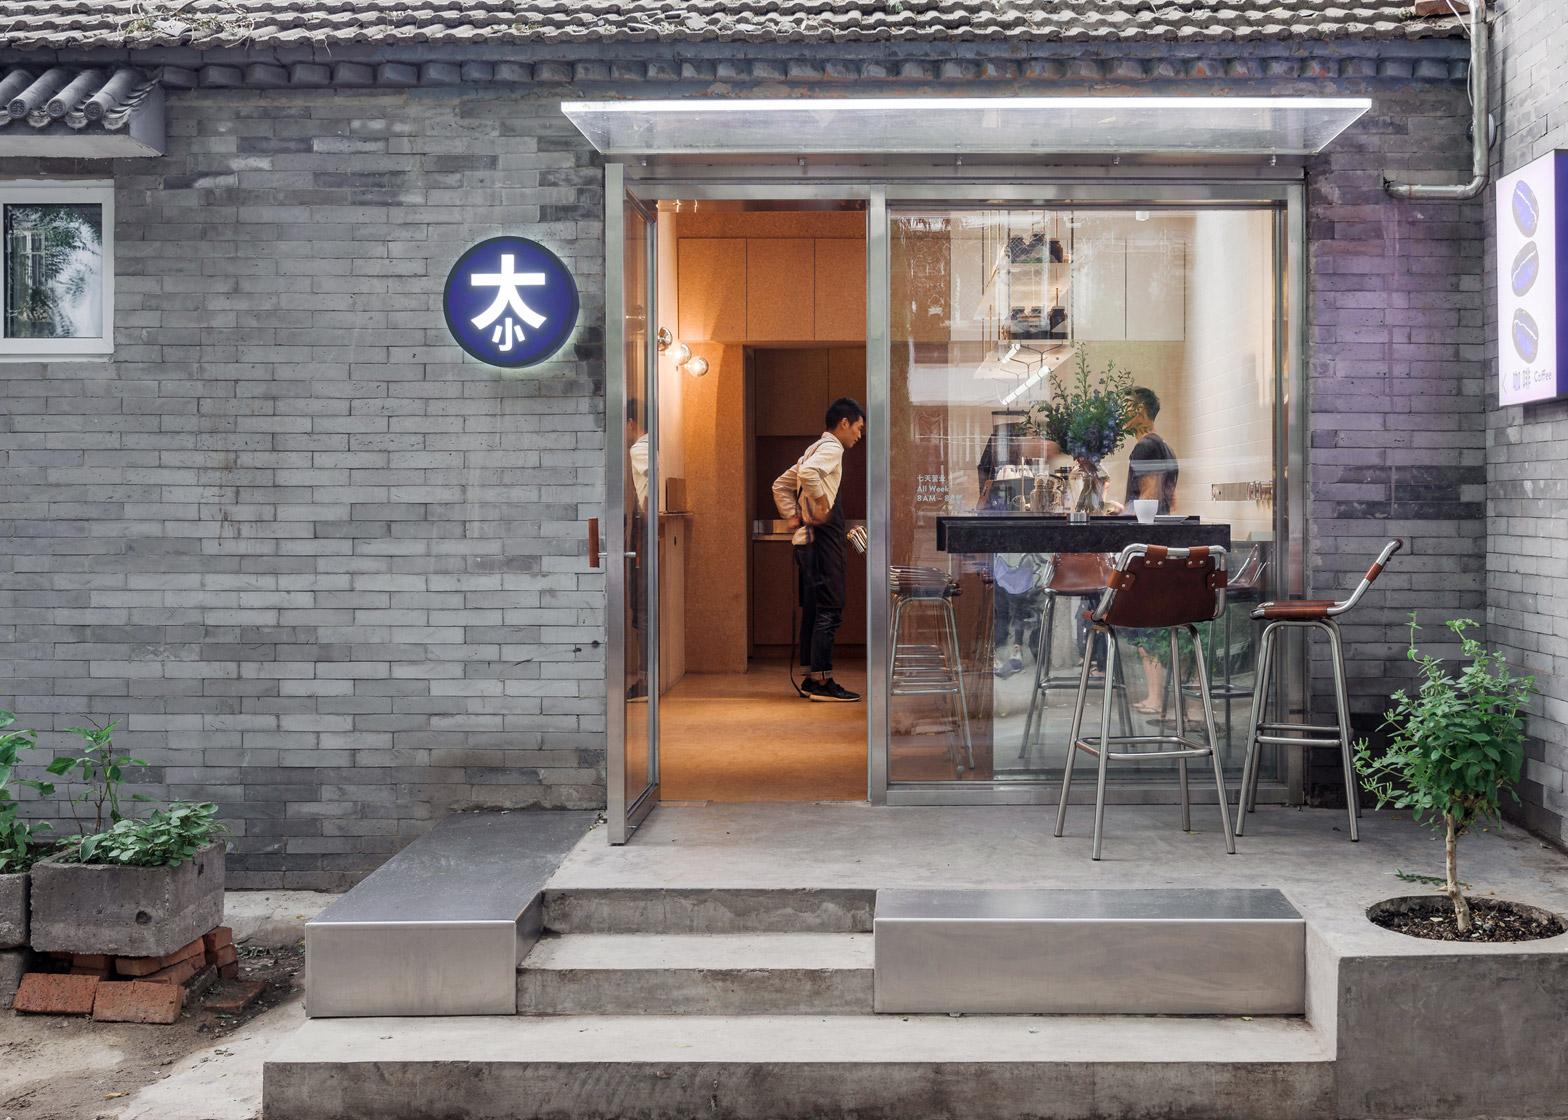 big-small-coffee-bar-b-and-b-guest-room-hutong-office-aio-beijing-cork_dezeen_1568_9